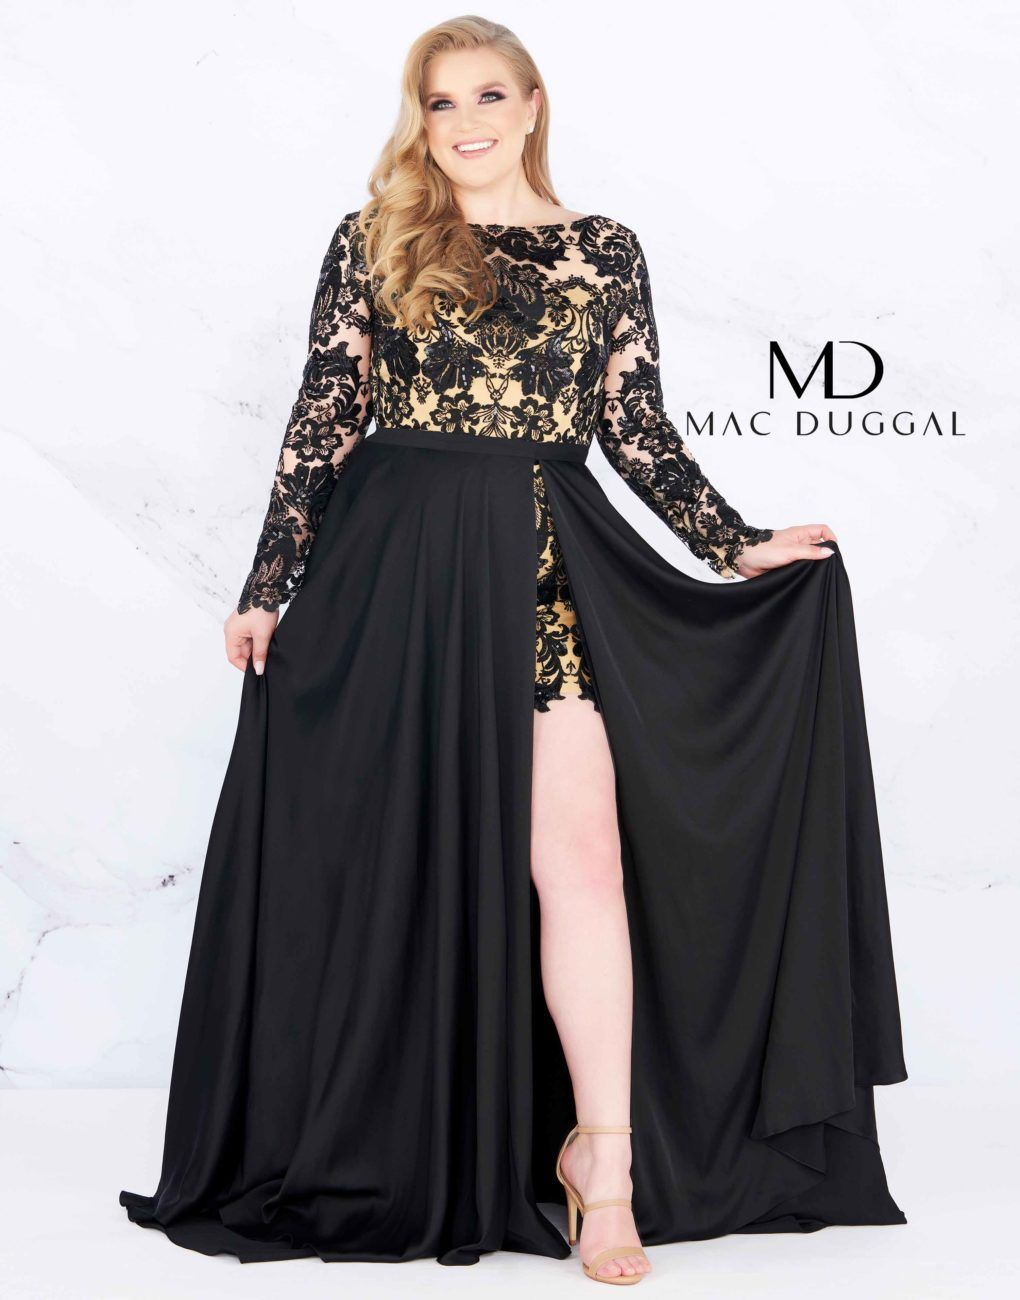 b3efdab77e494 66809F - Mac Duggal Plus Size Prom Dress in 2019 | Plus size prom ...